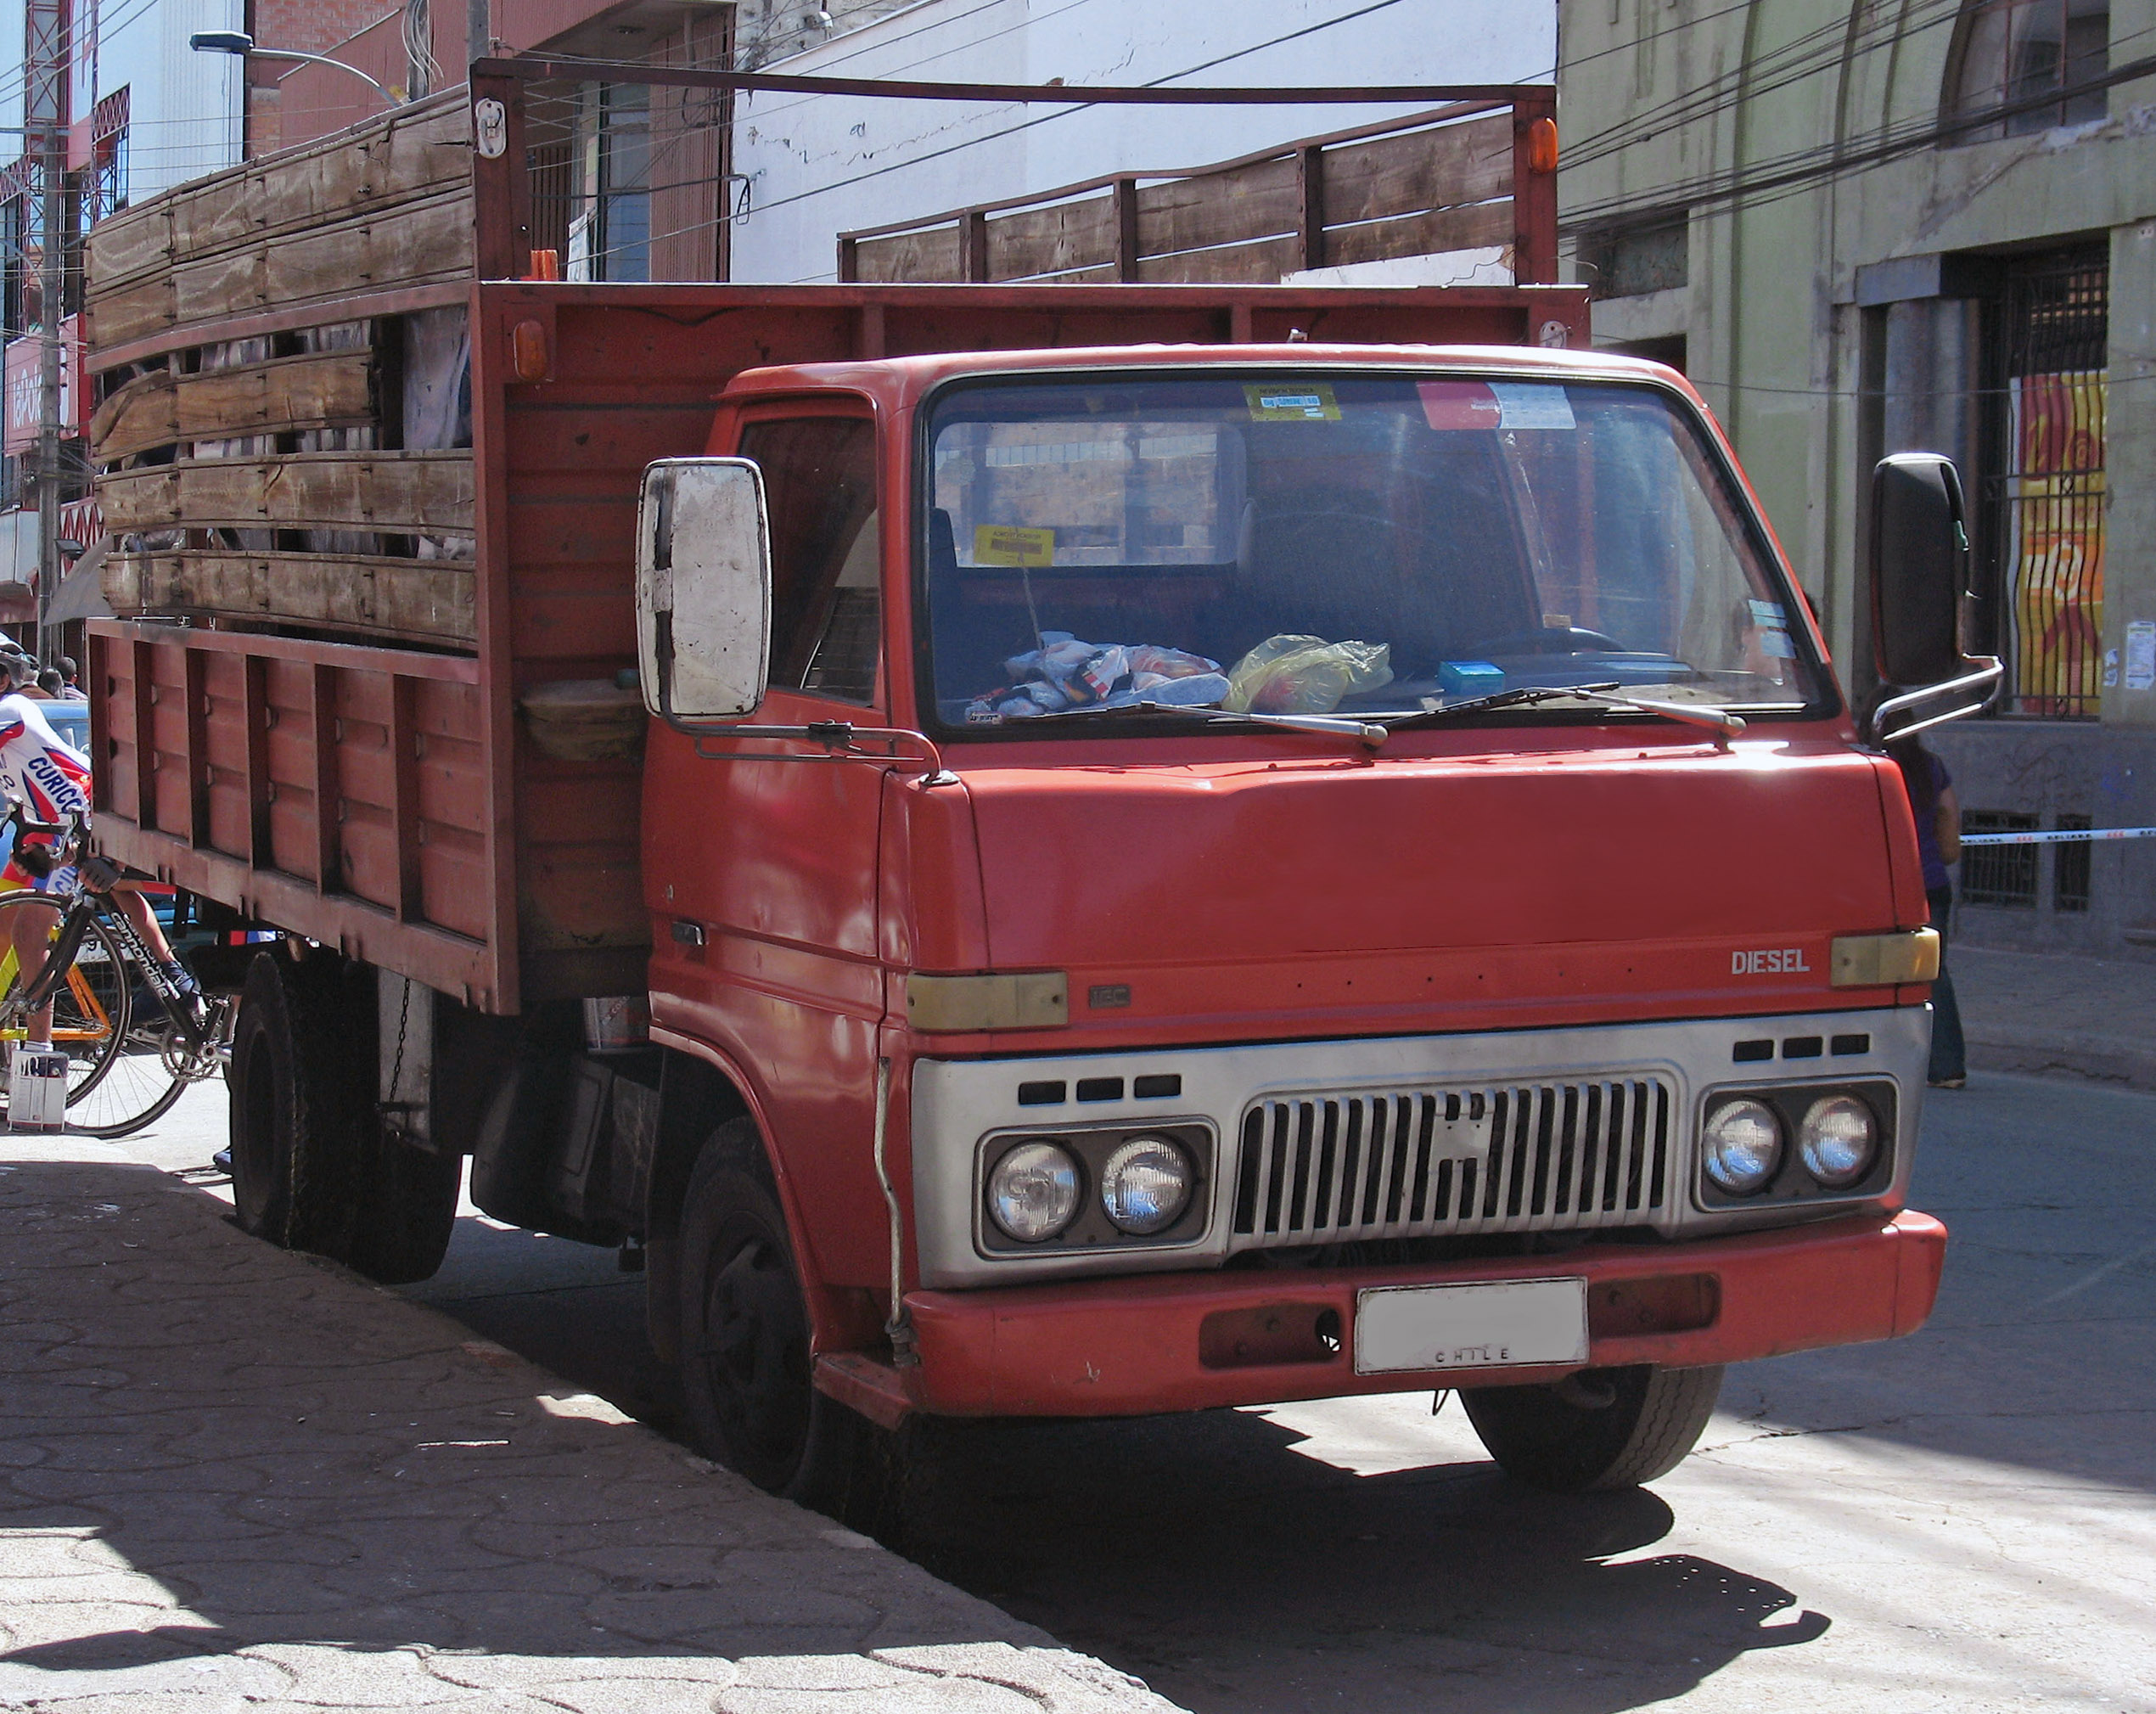 File:Daihatsu Delta Diesel 1983 jpg - Wikimedia Commons